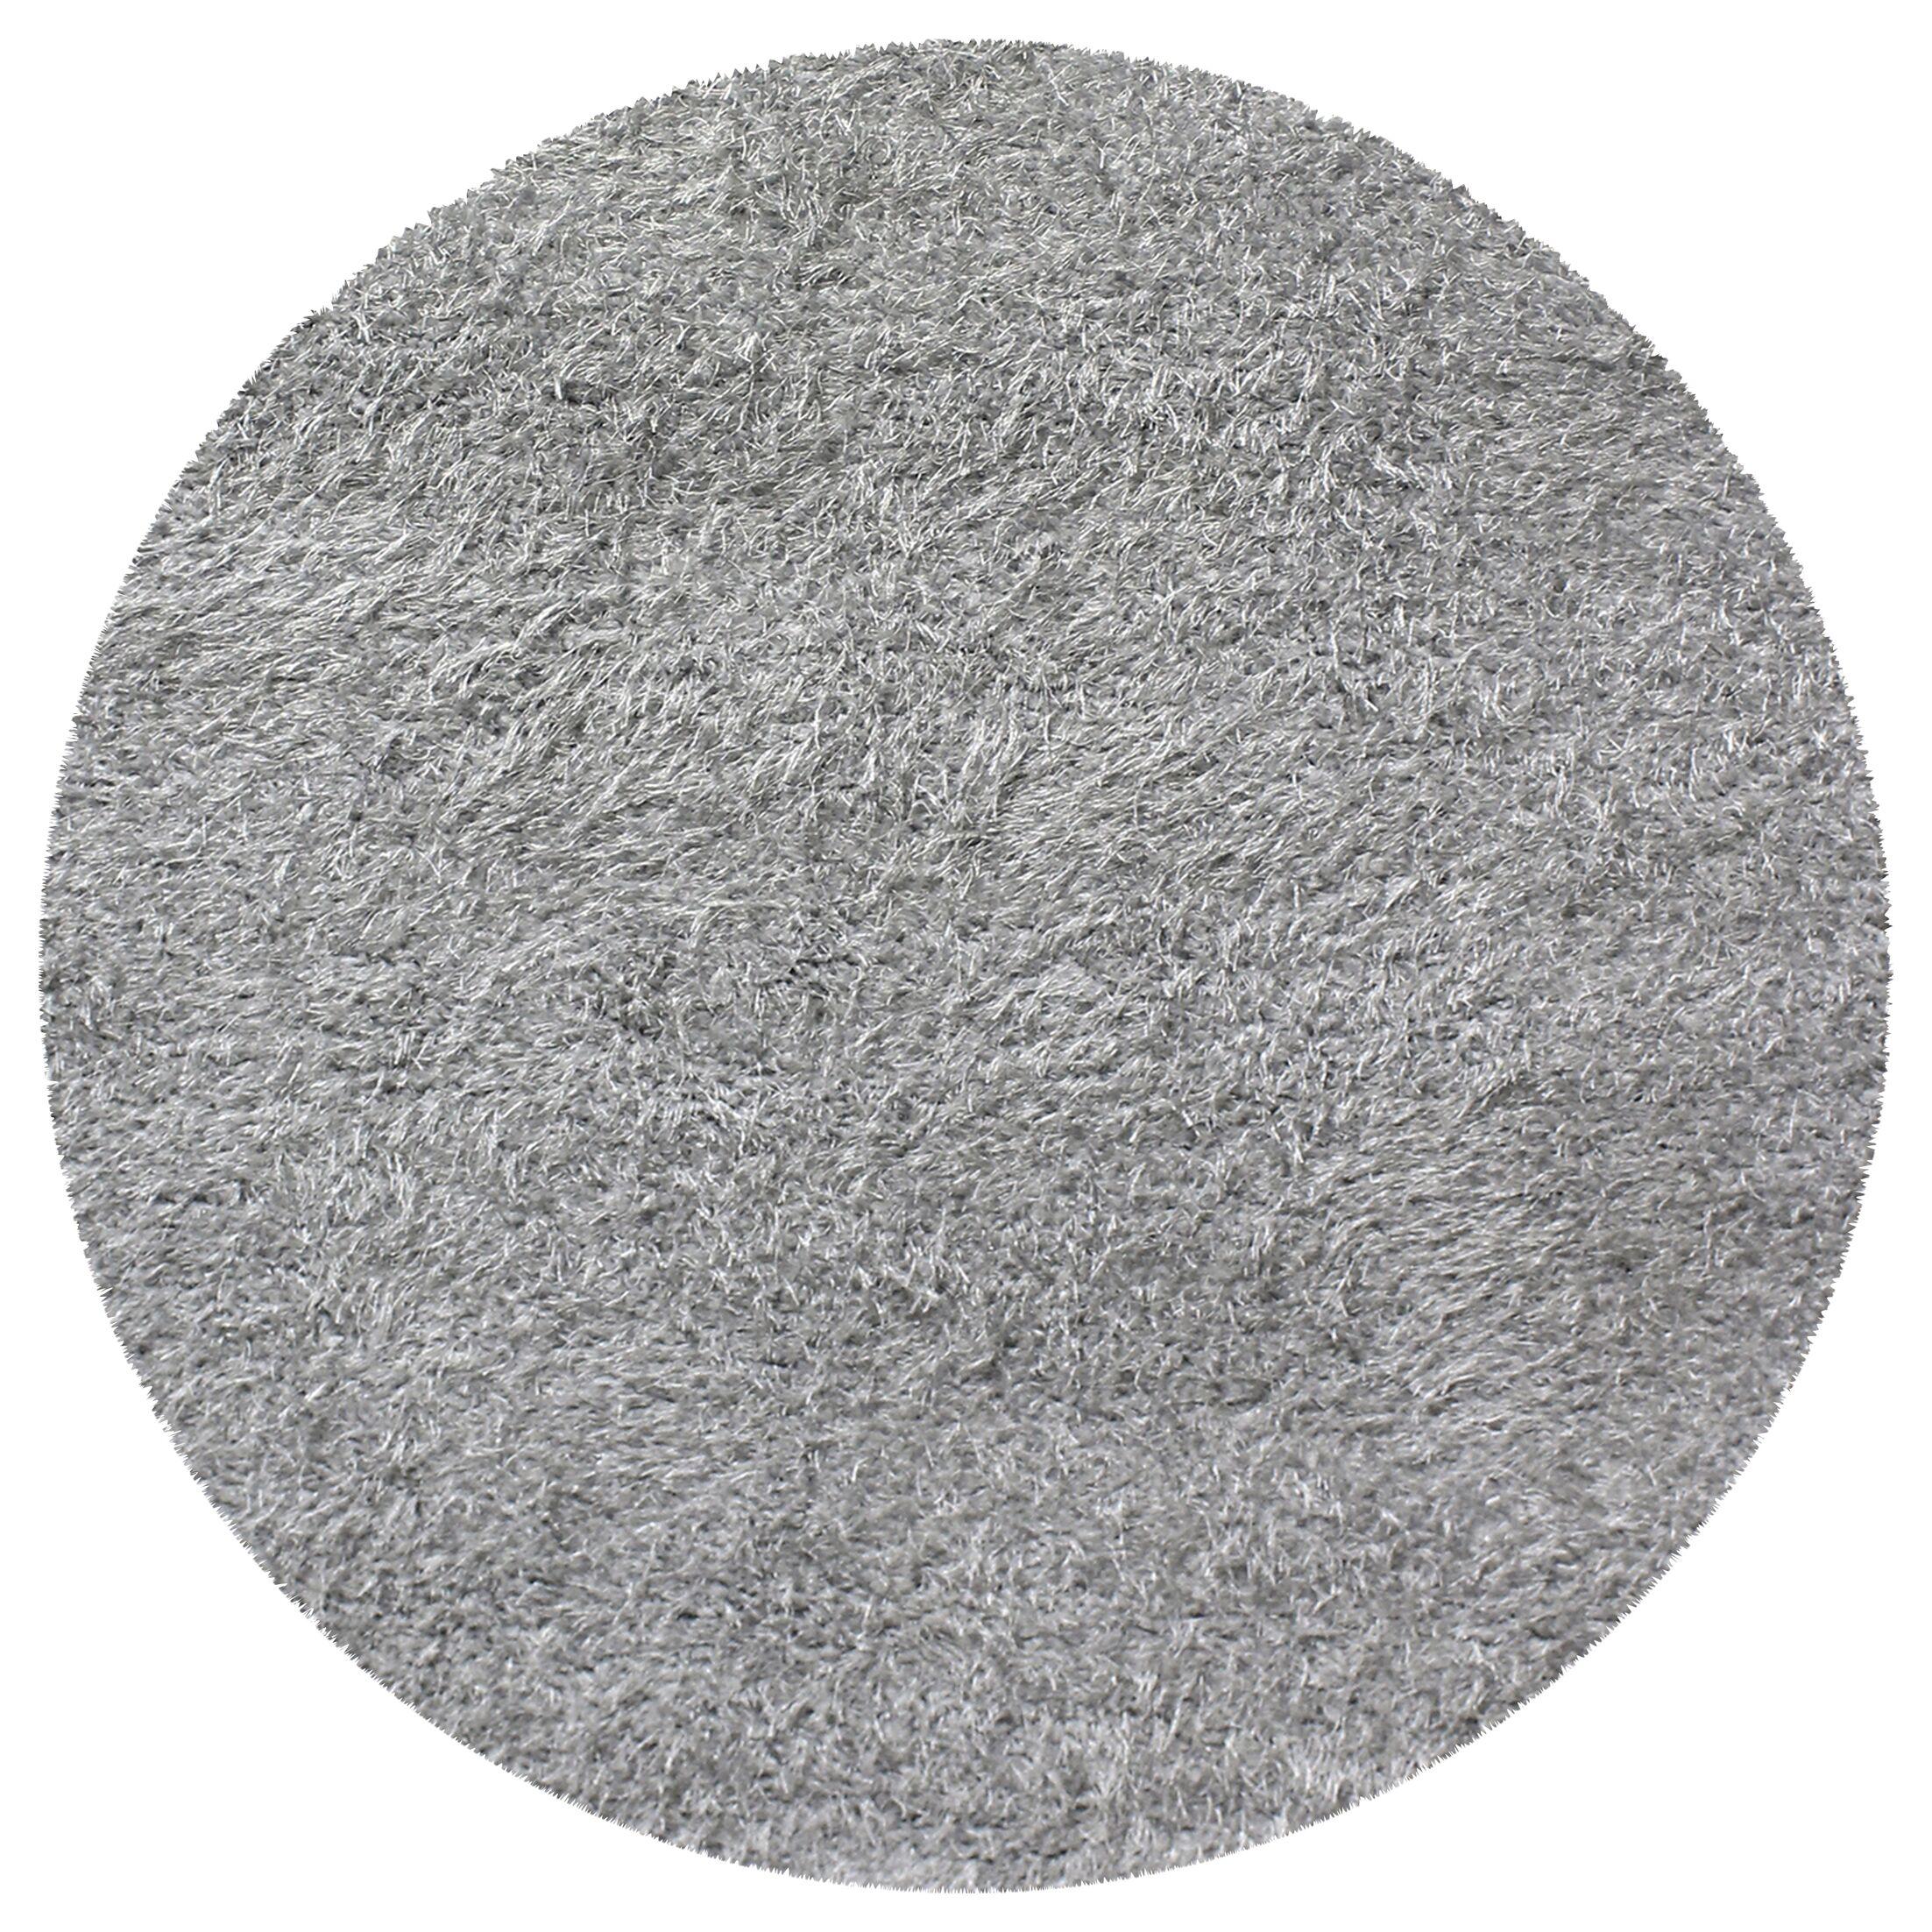 Blaisdell Shag Hand Woven Silver Area Rug Rug Size: Round 6'6